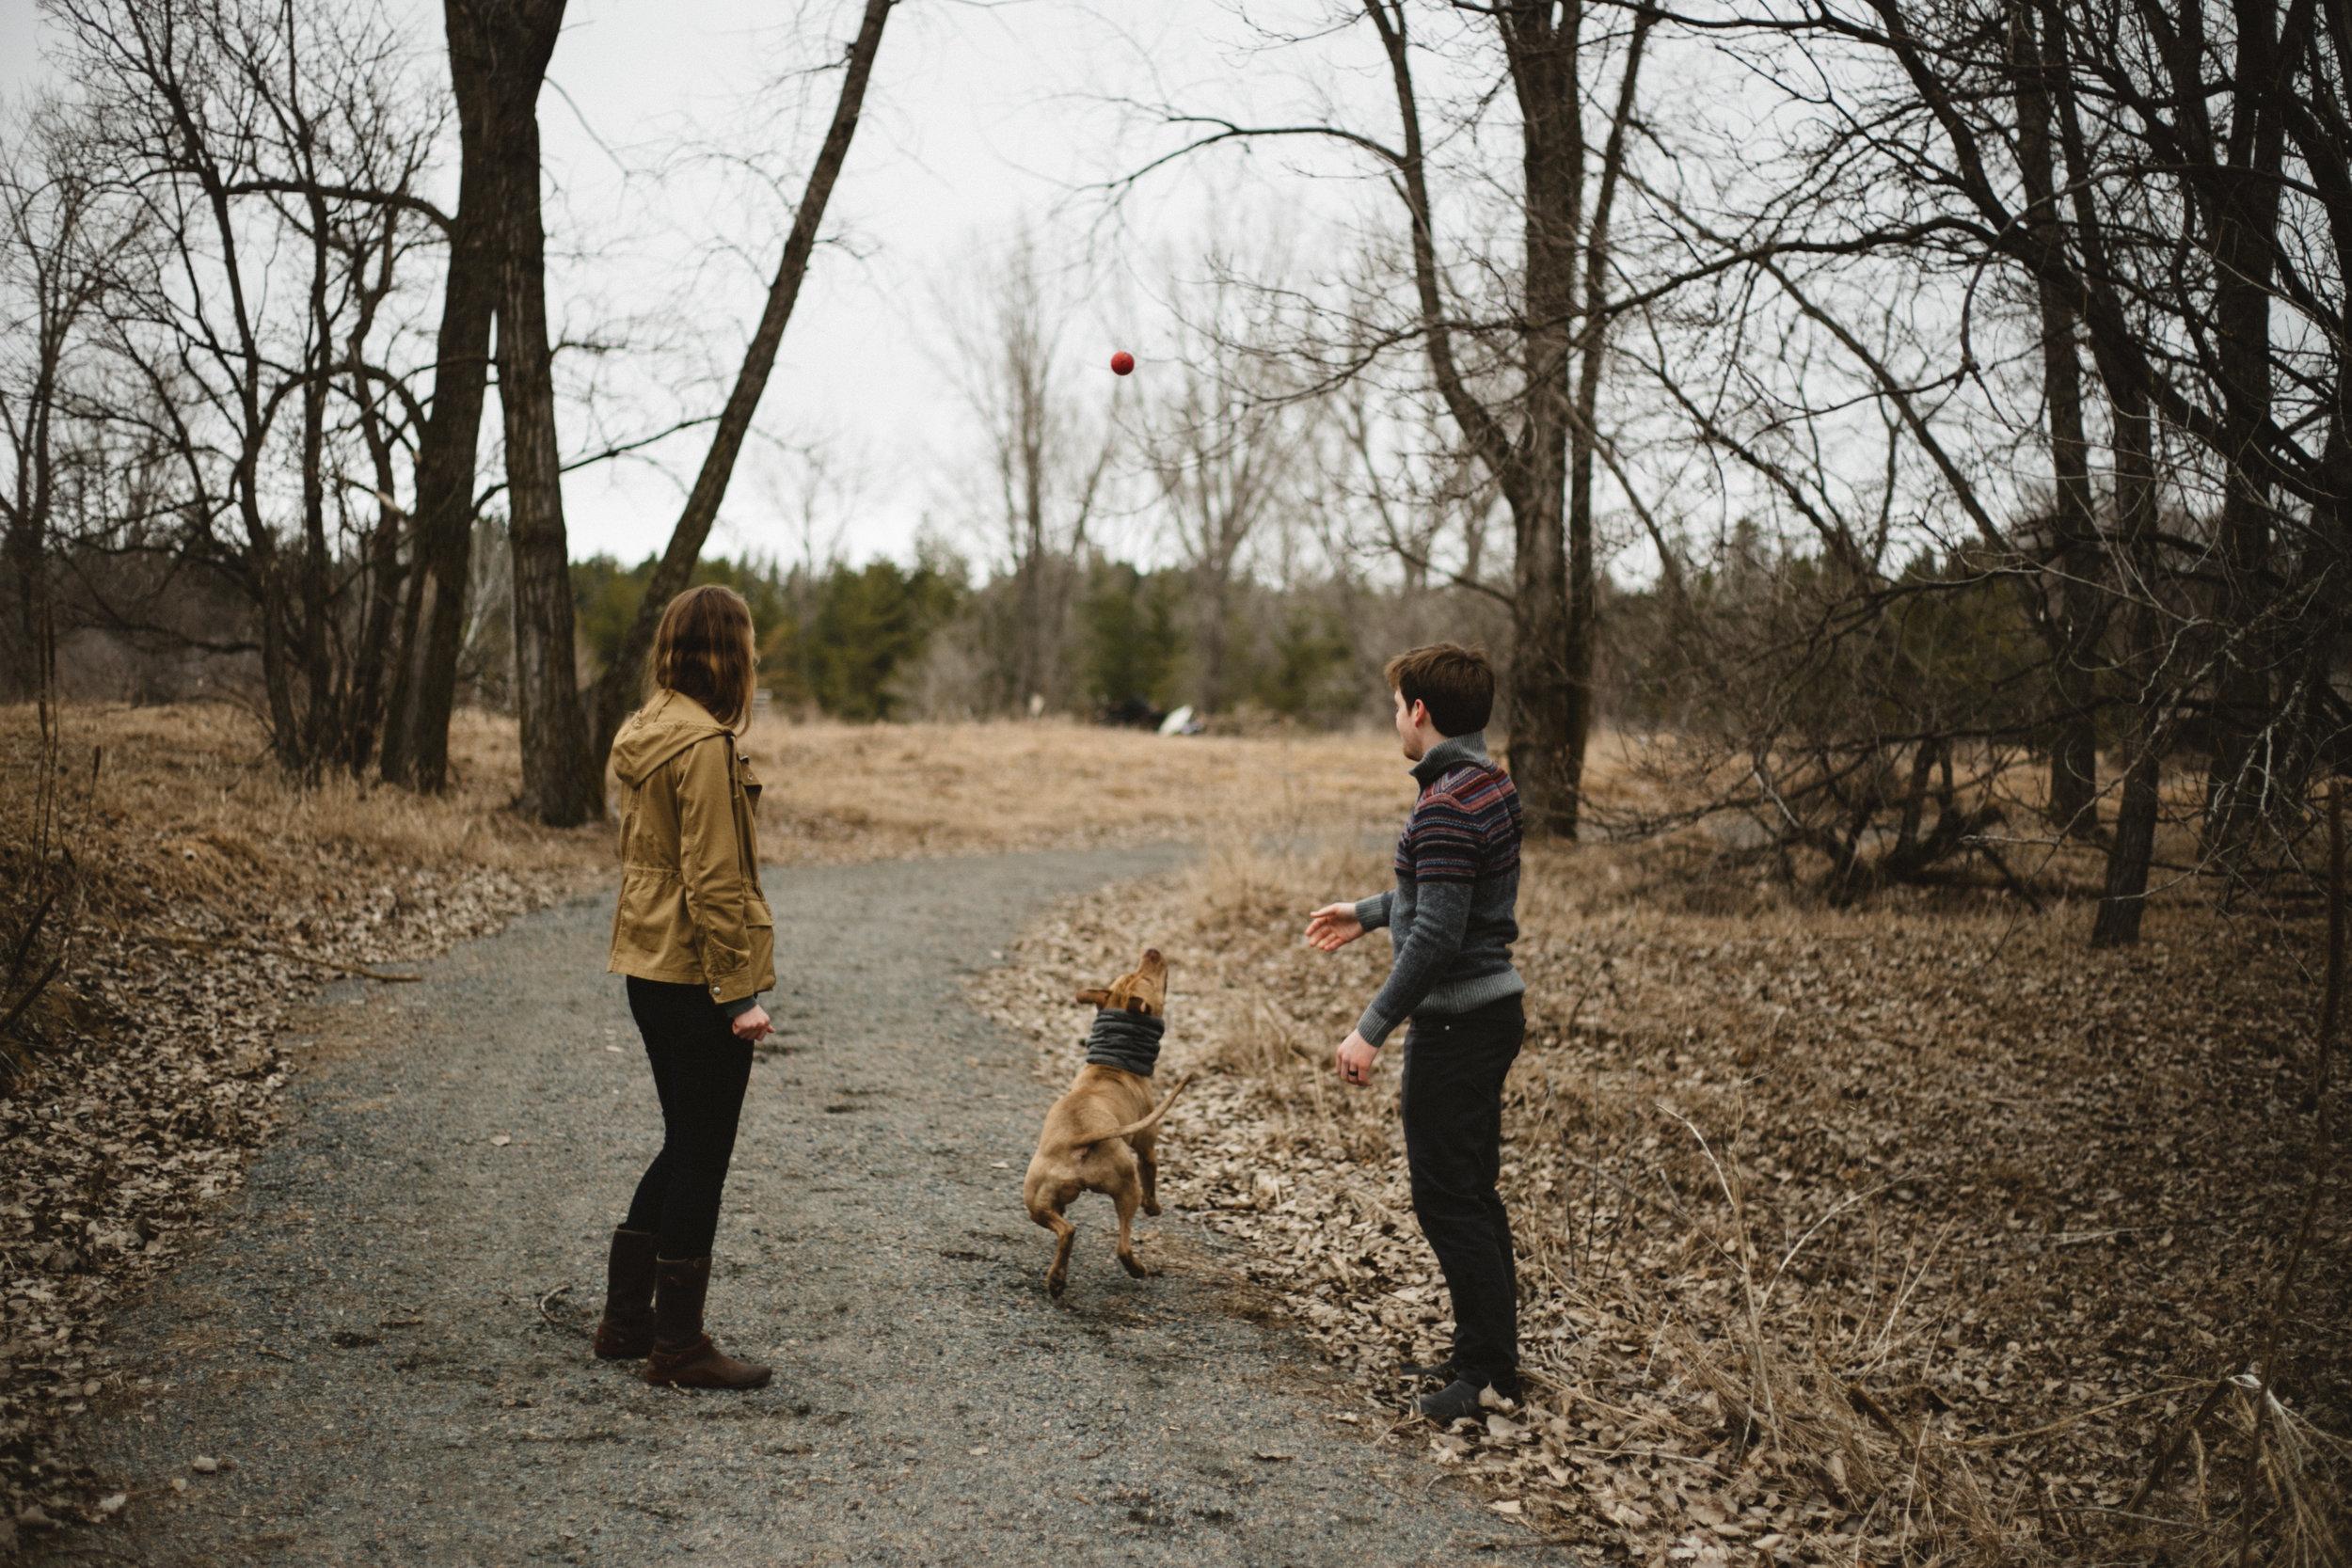 Documentary engagement session in Brainerd Minnesota, photographed by wedding photographer Britt DeZeeuw photography